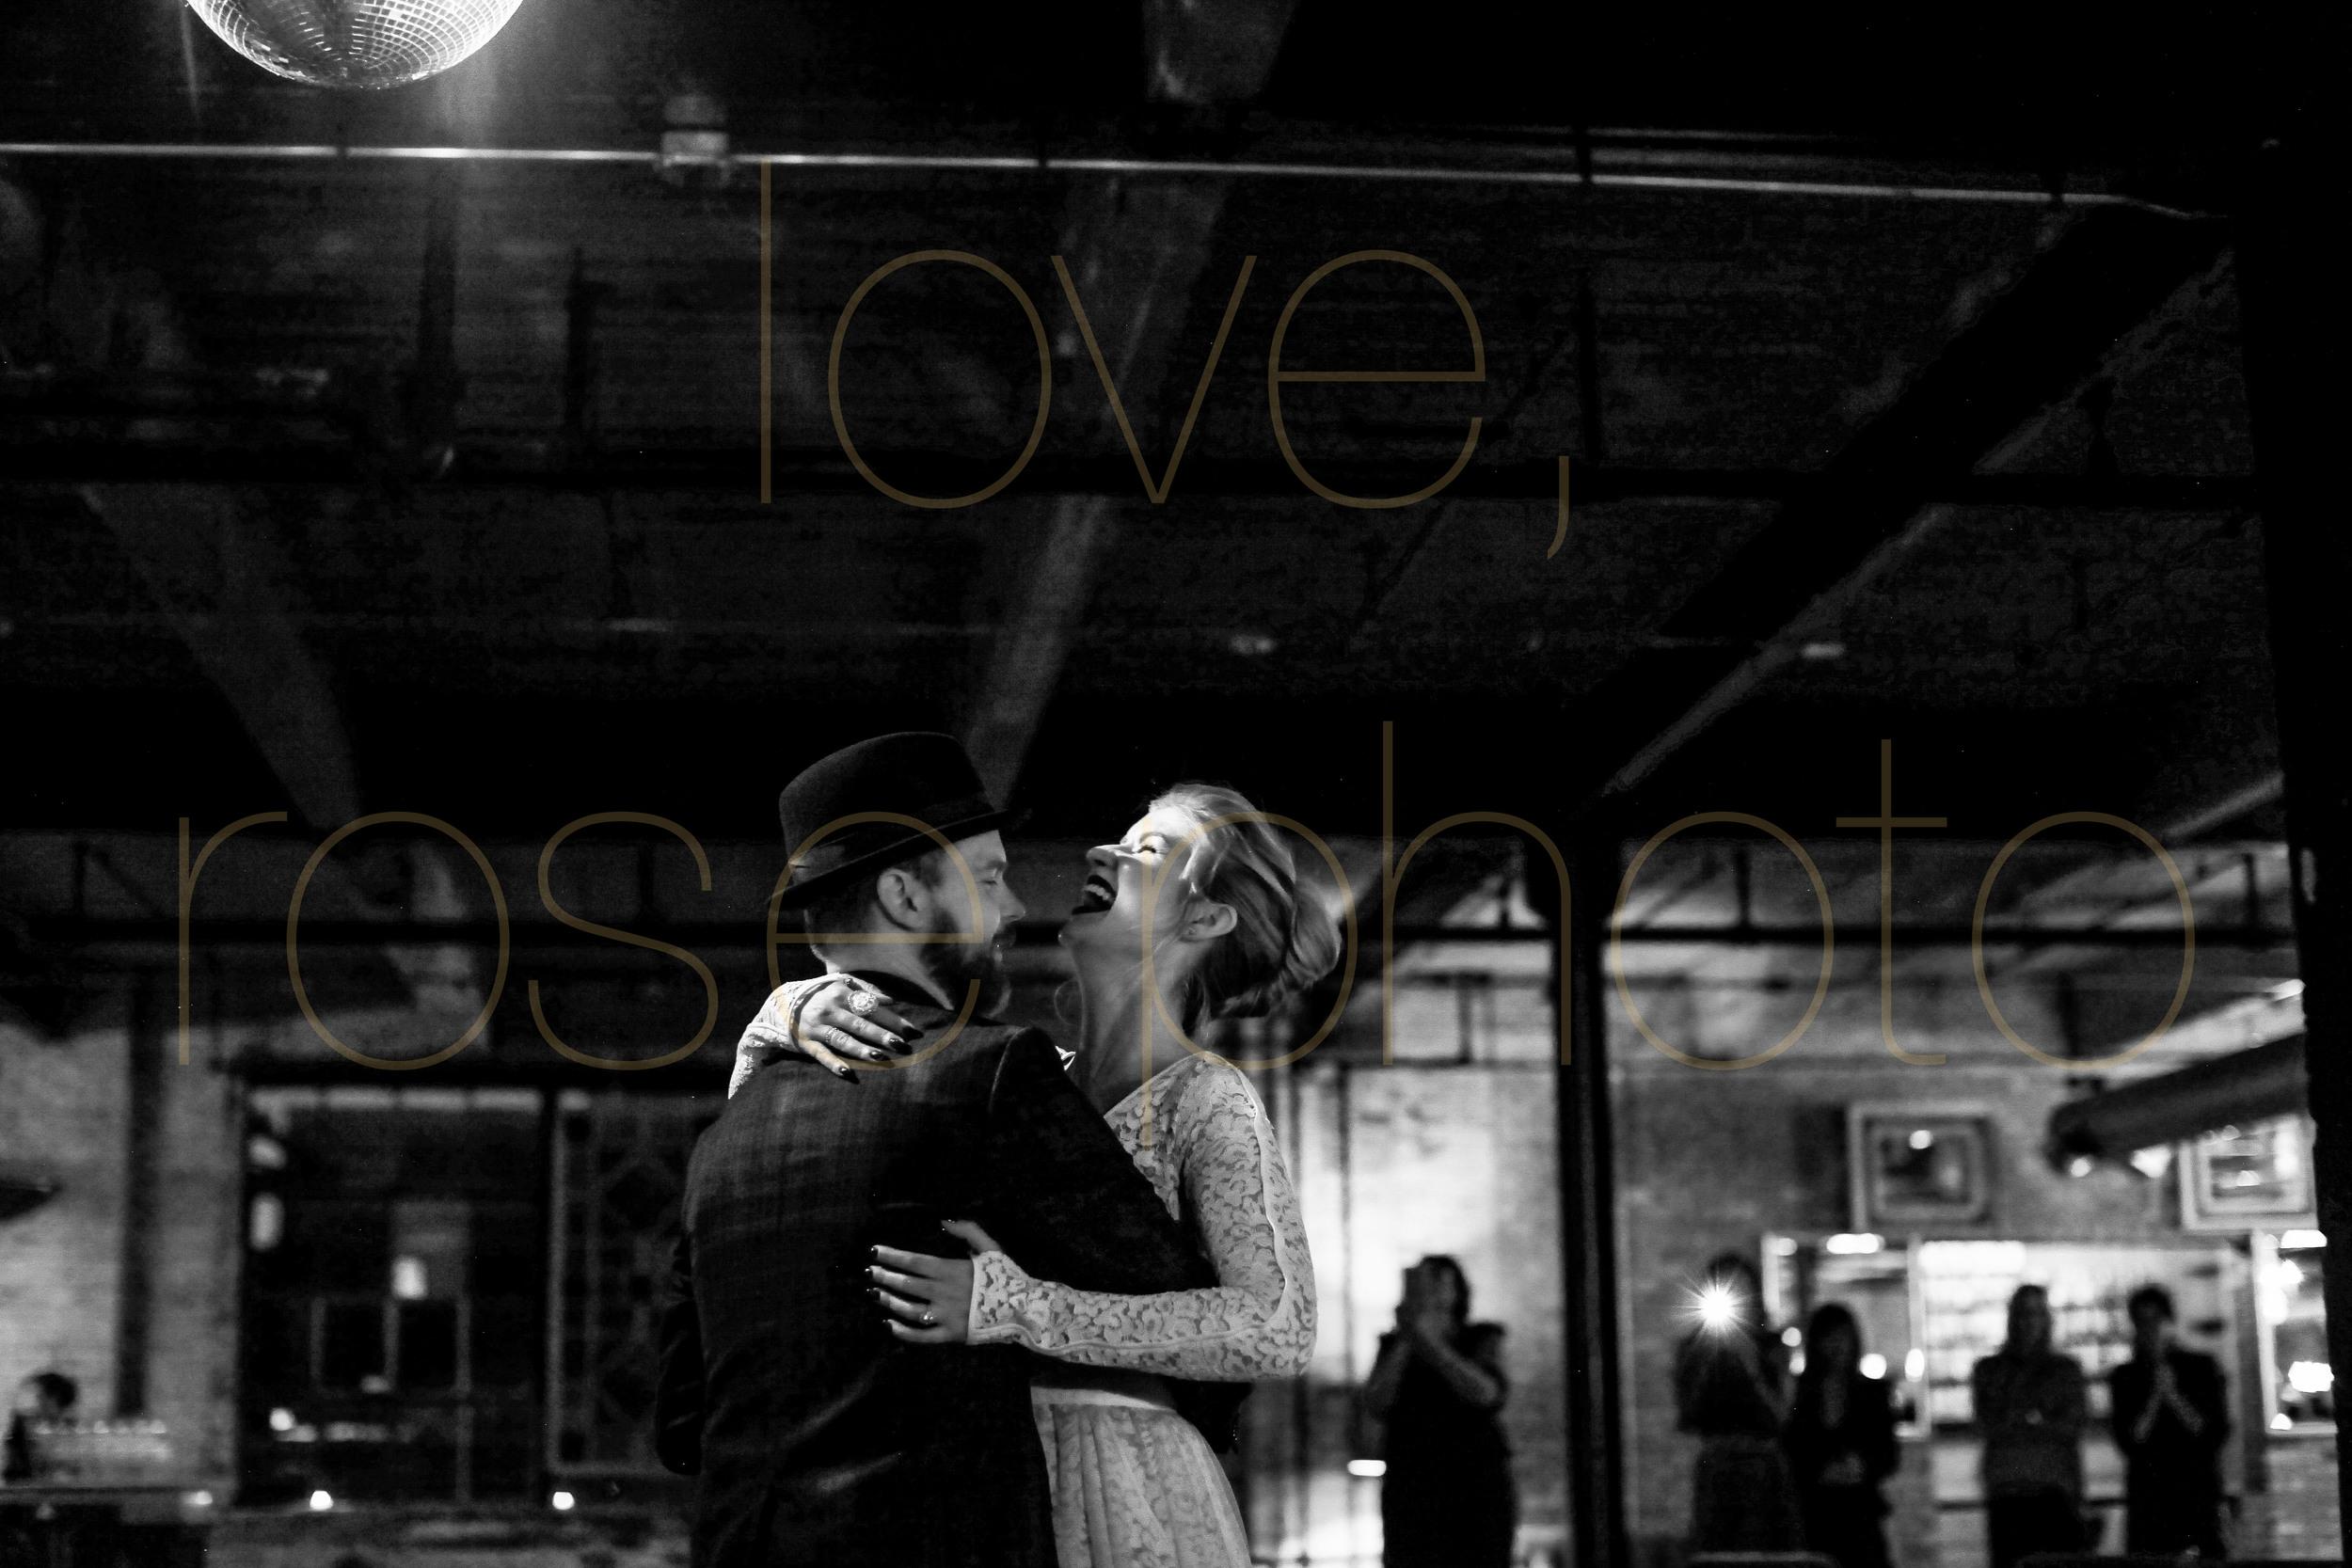 West Fulton Chicago Wedding Venue Salvage One photography enagement photos bride groom first dance-30.jpg